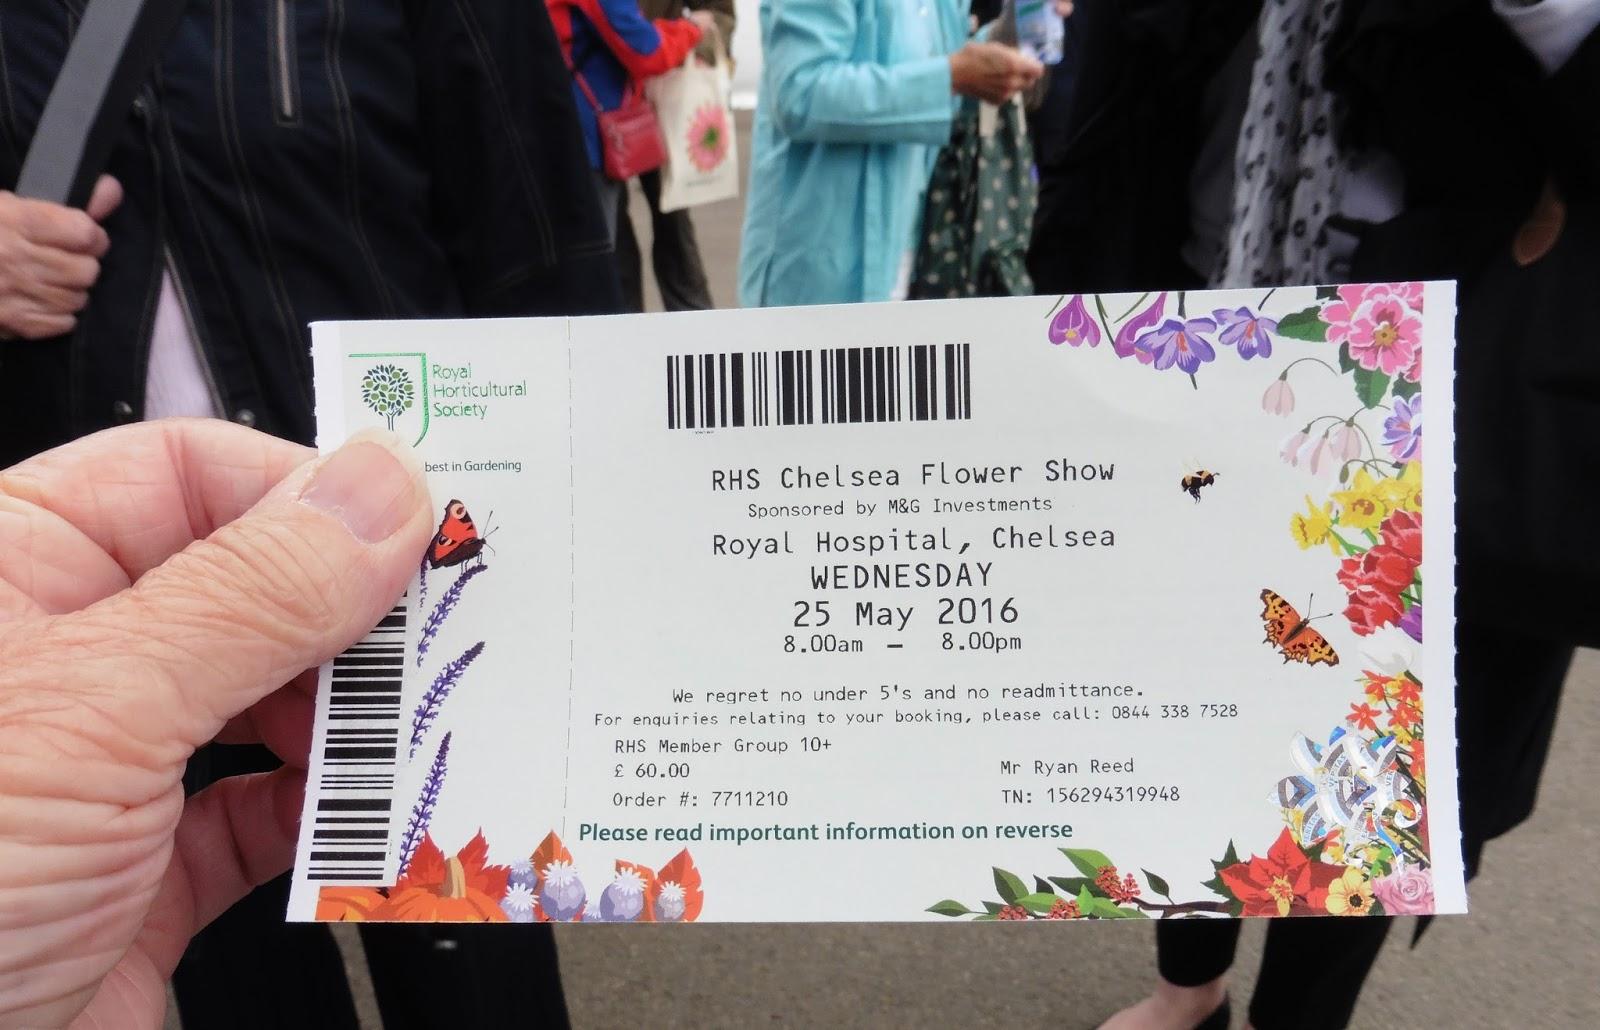 Chelsea Flower Show Cheap Tickets